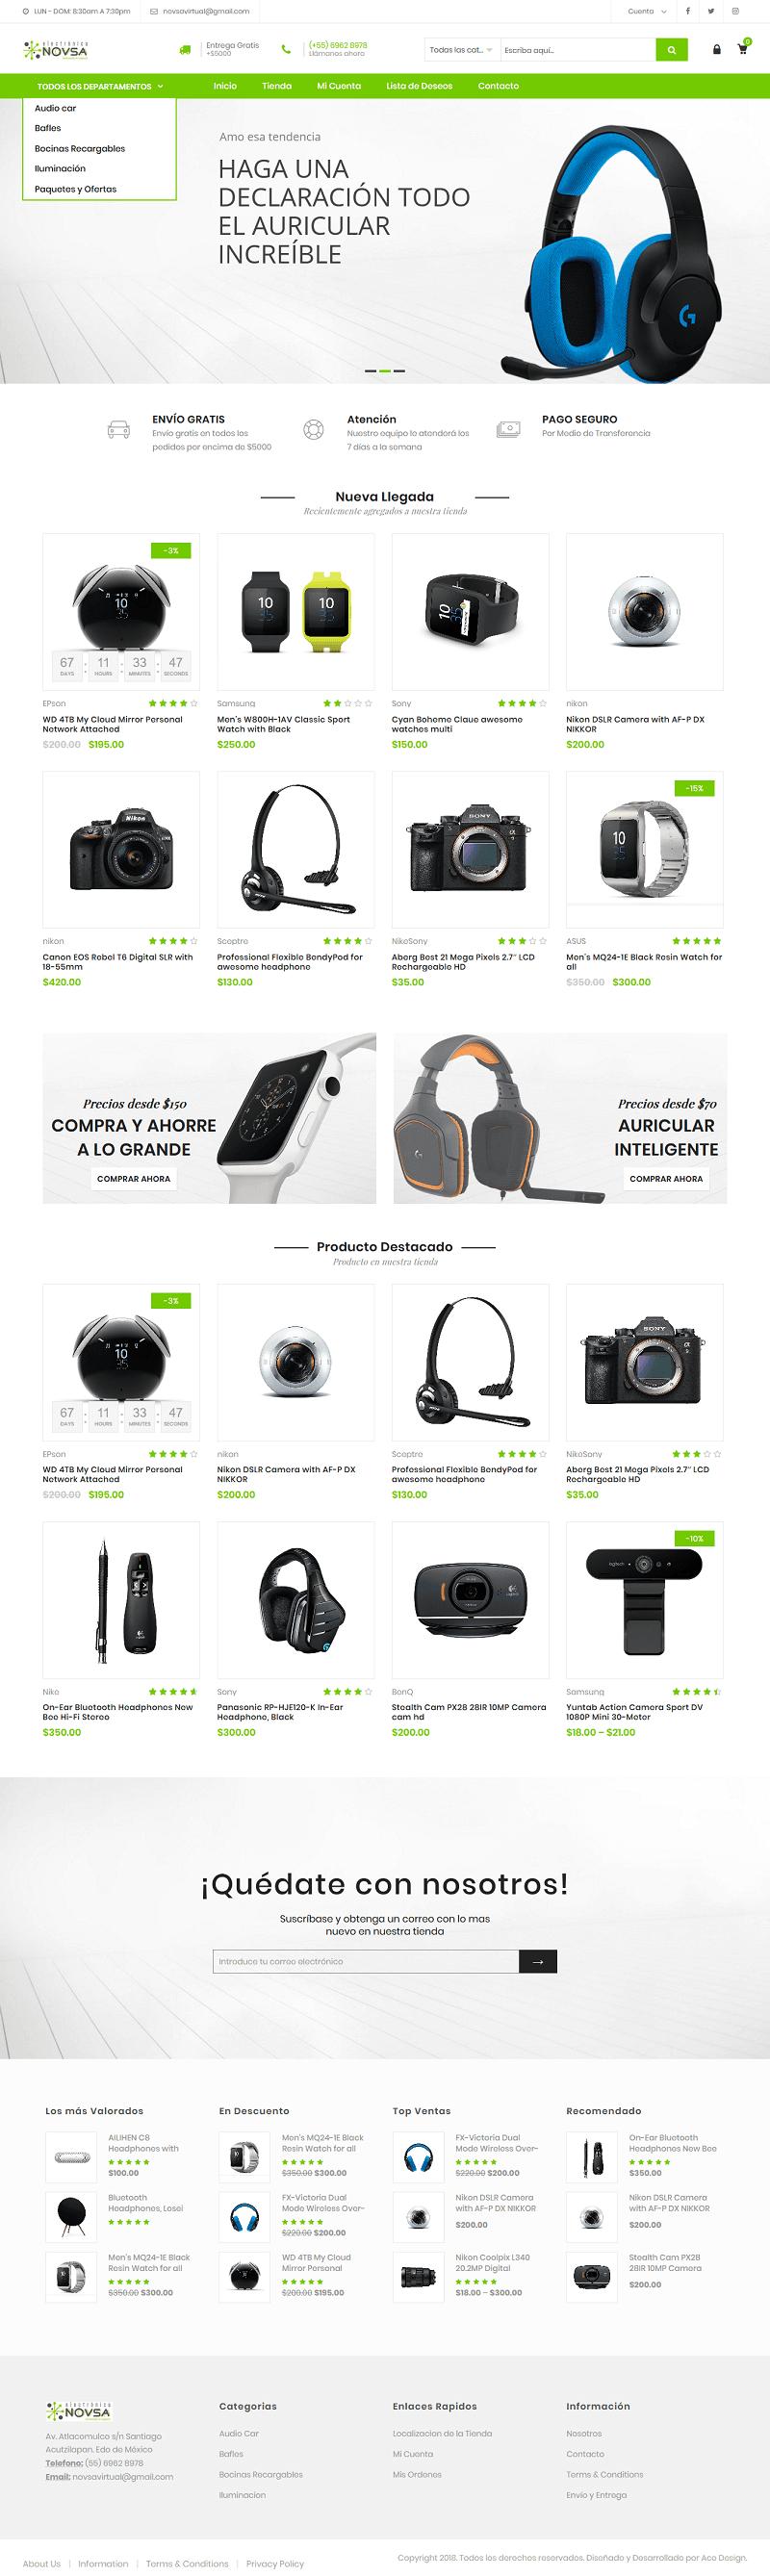 www.electronicanovsa.com